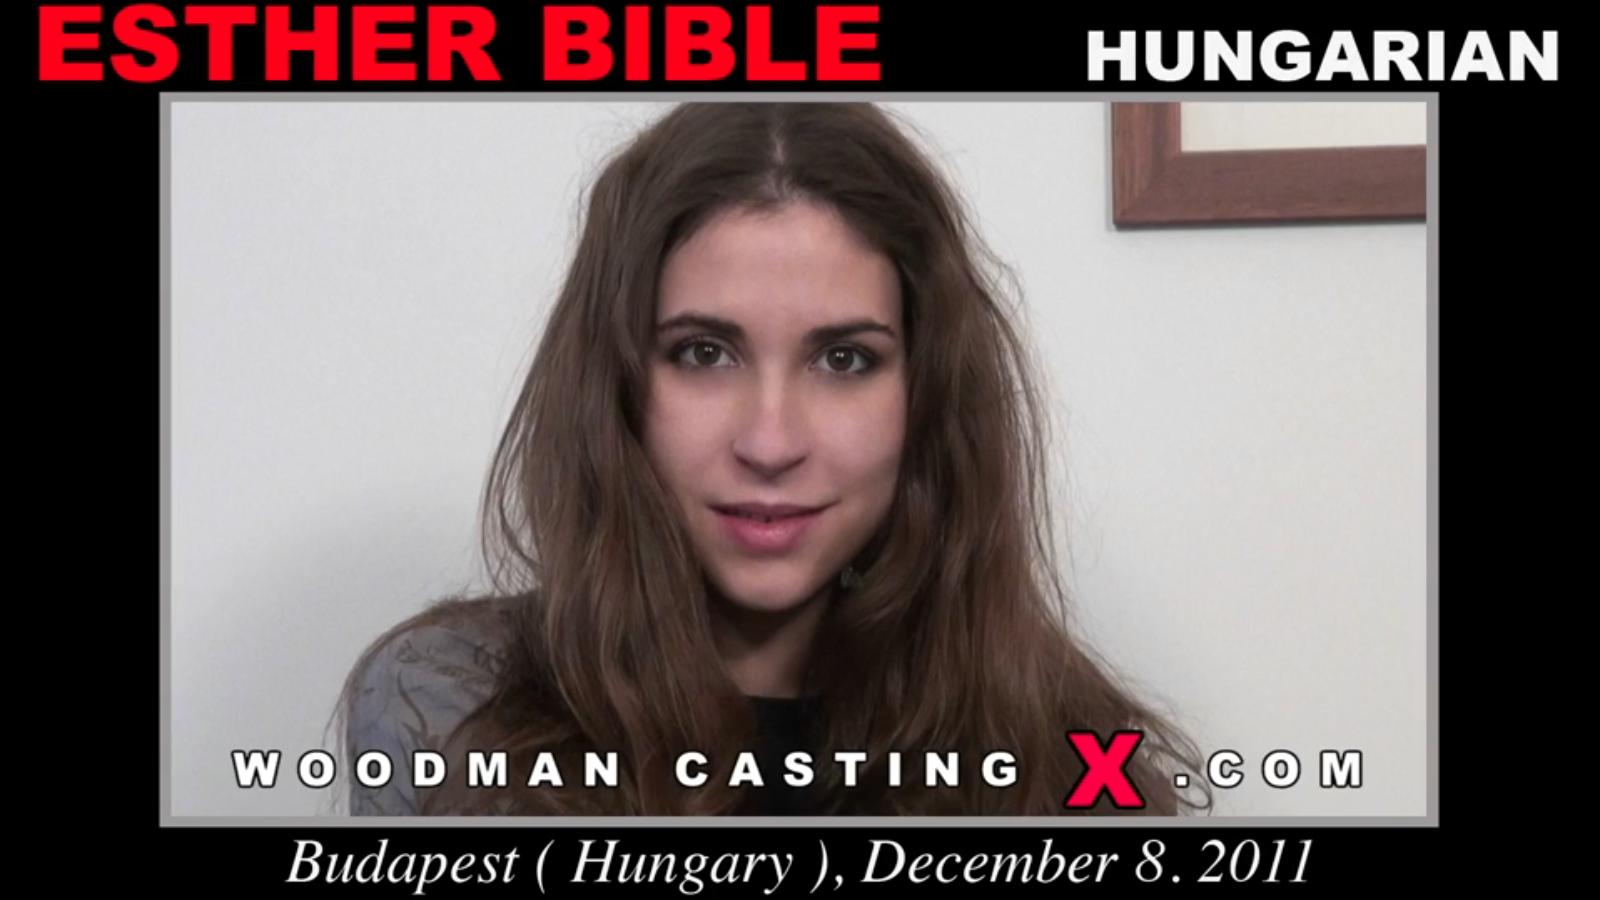 Esther Bible Woodman Casting X